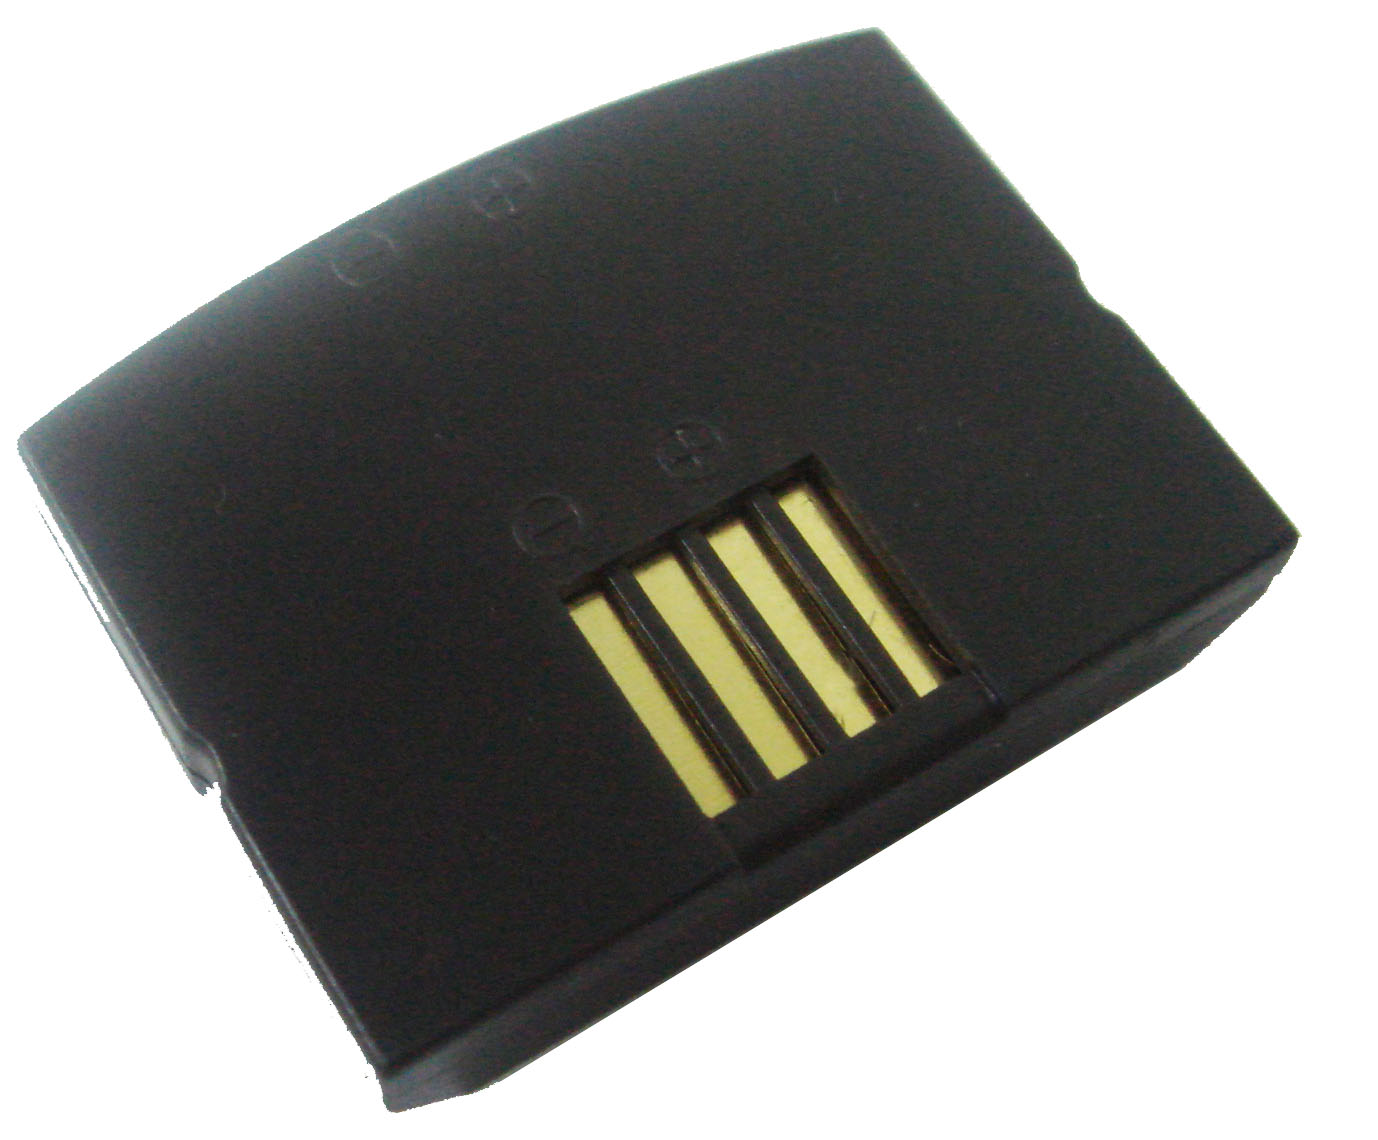 Sennheiser BA300 Battery Image002_1